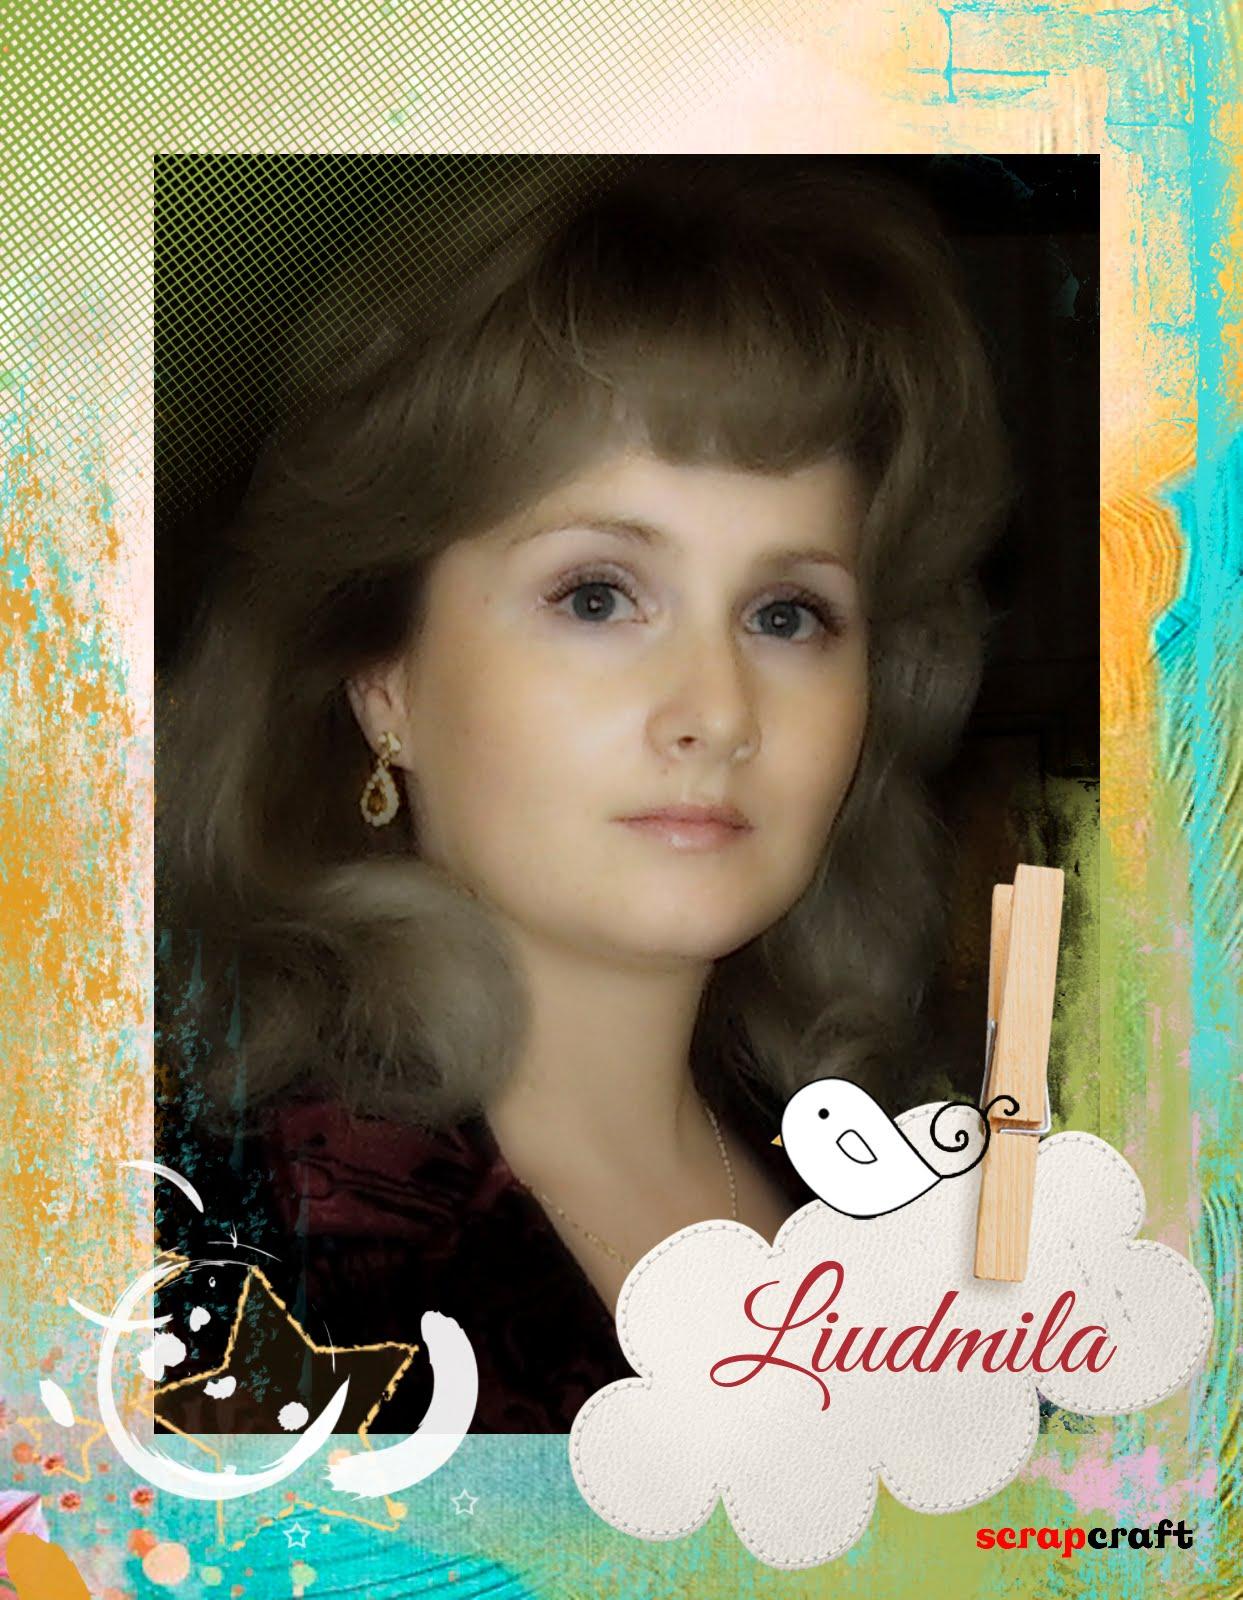 Ljudmila Tanvel